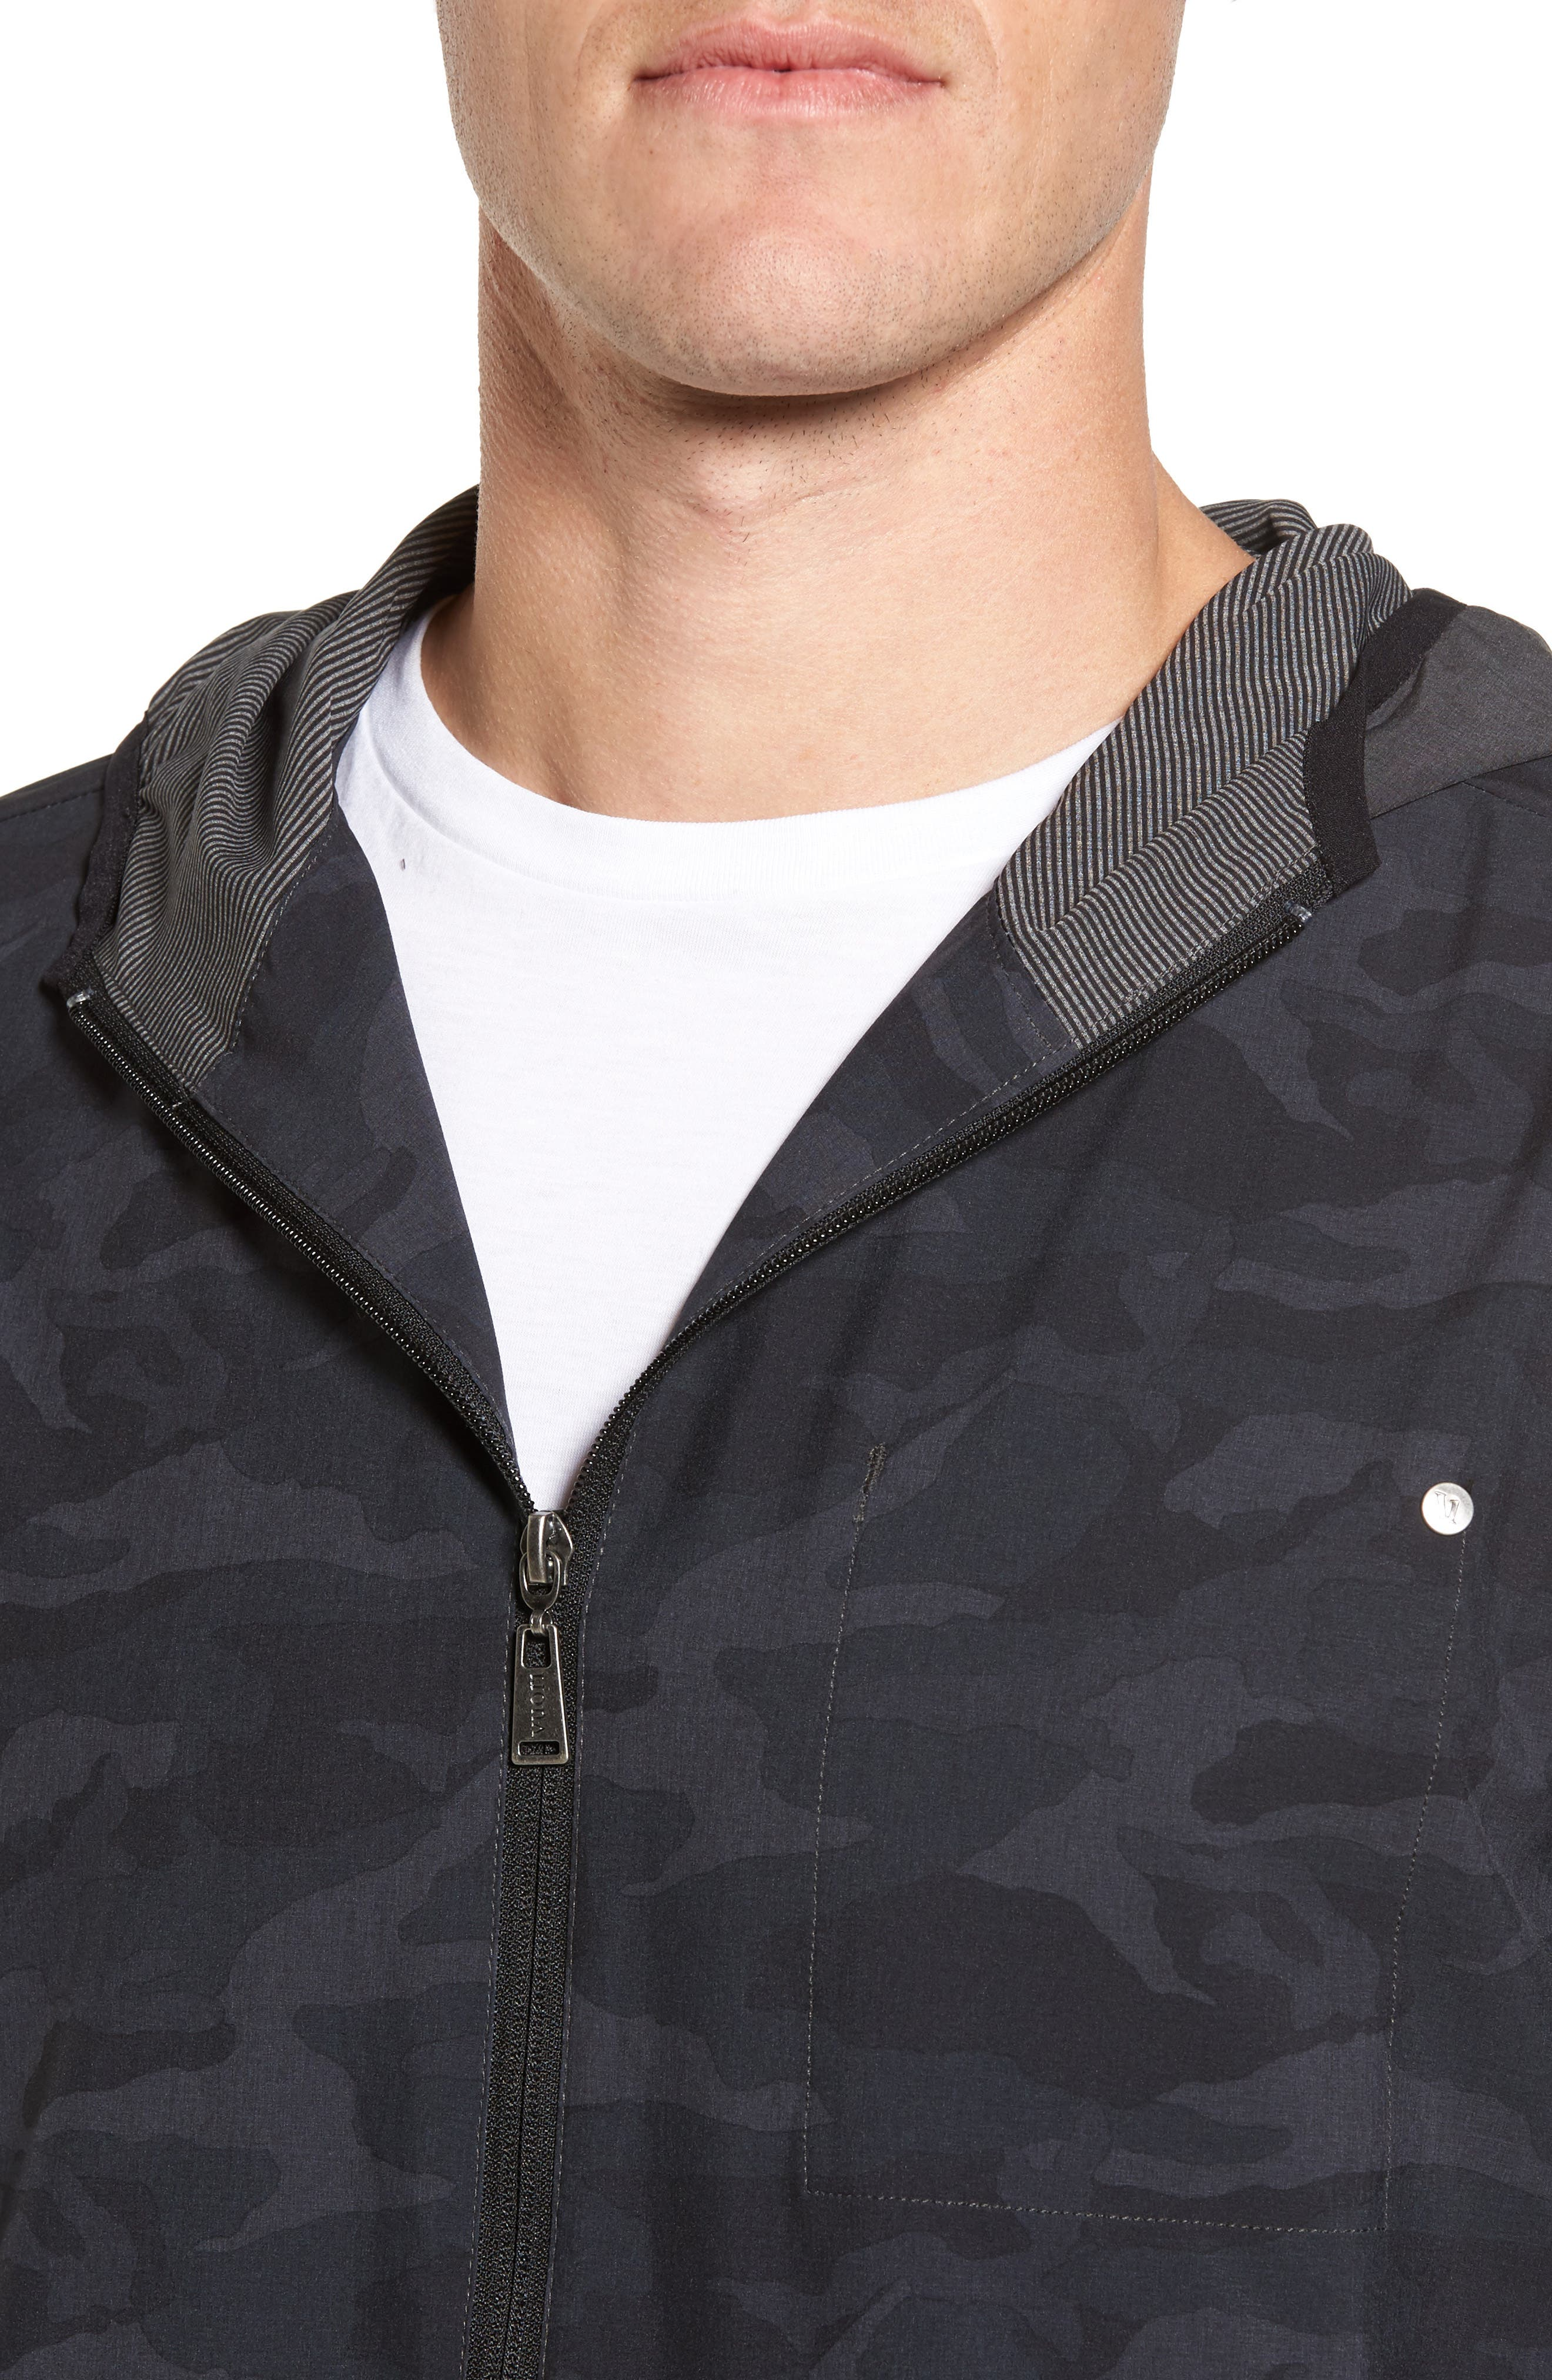 VUORI,                             Outdoor Training Shell Jacket,                             Alternate thumbnail 4, color,                             021